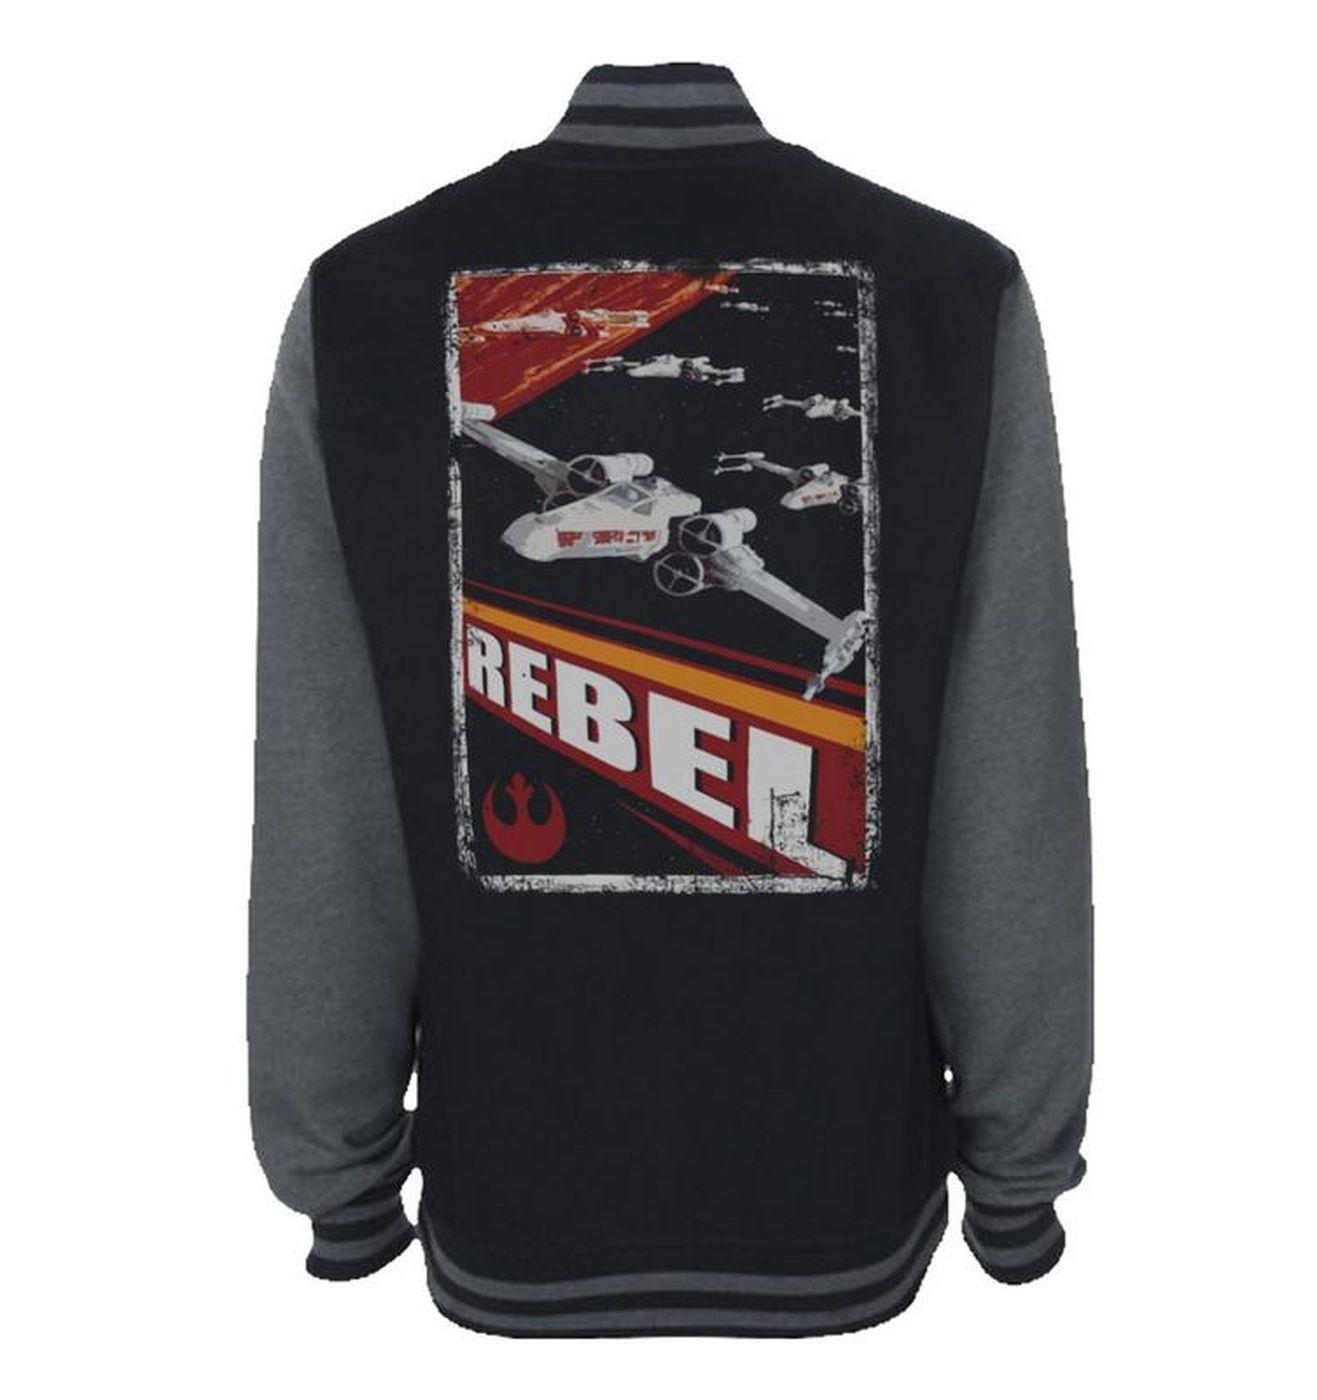 Star Wars Rebel jacket